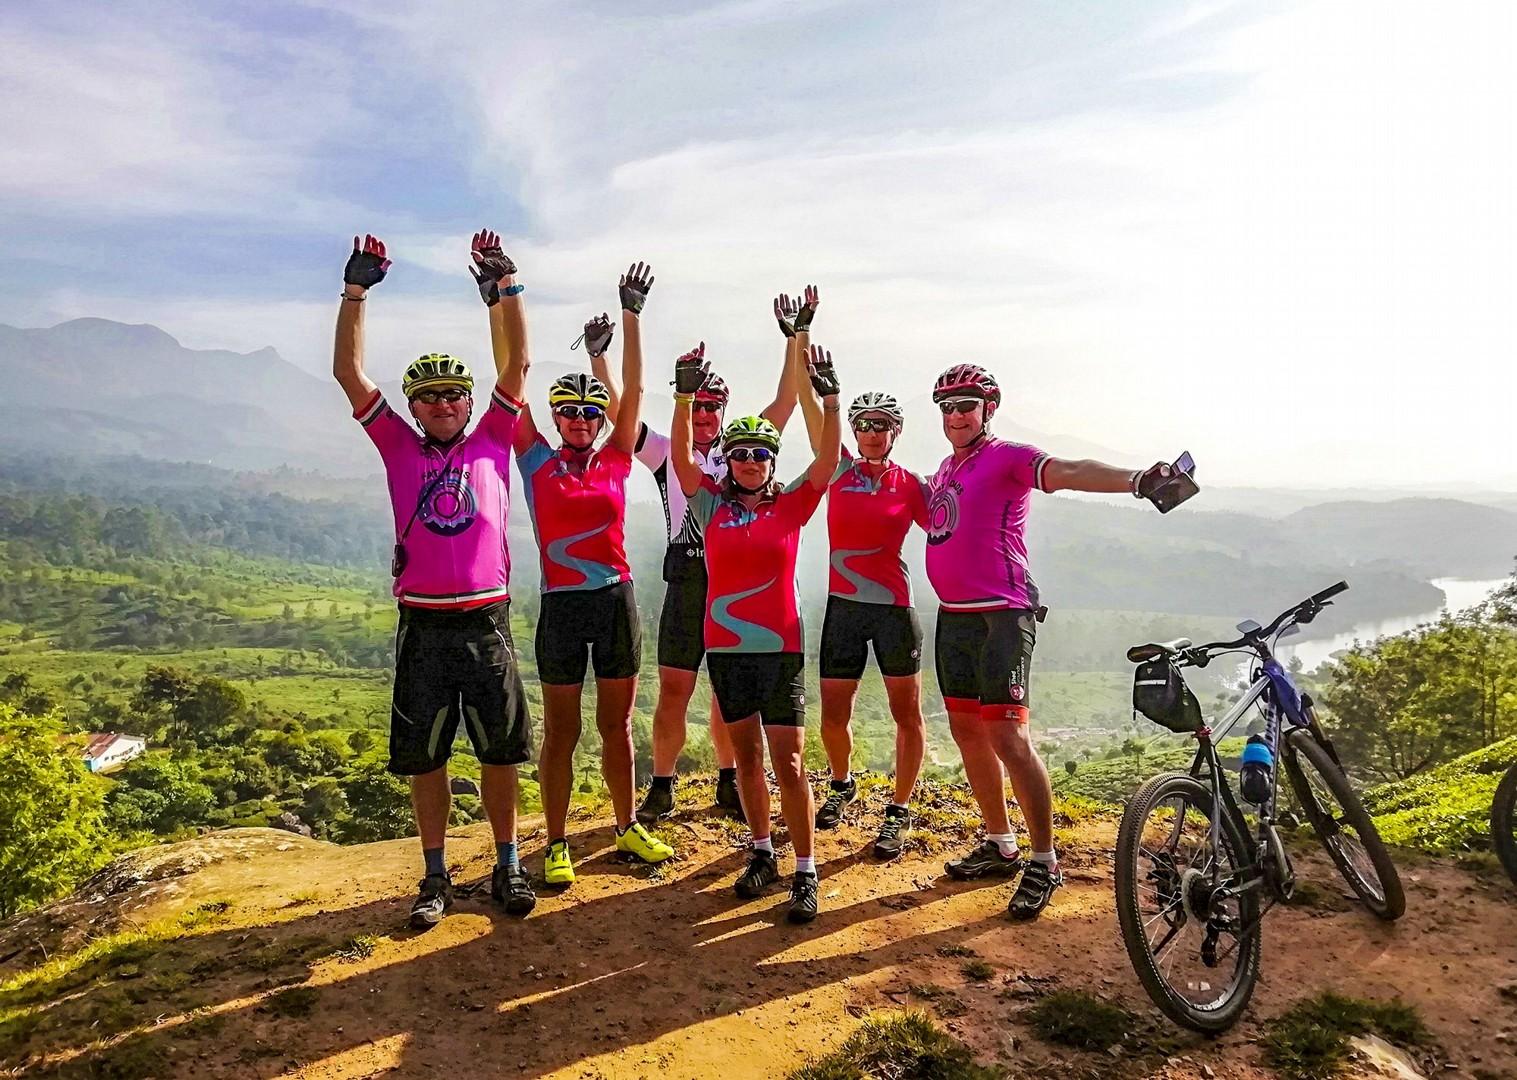 IMG_20181115_085505-2.jpg - India - Classic Kerala - Cycling Adventures